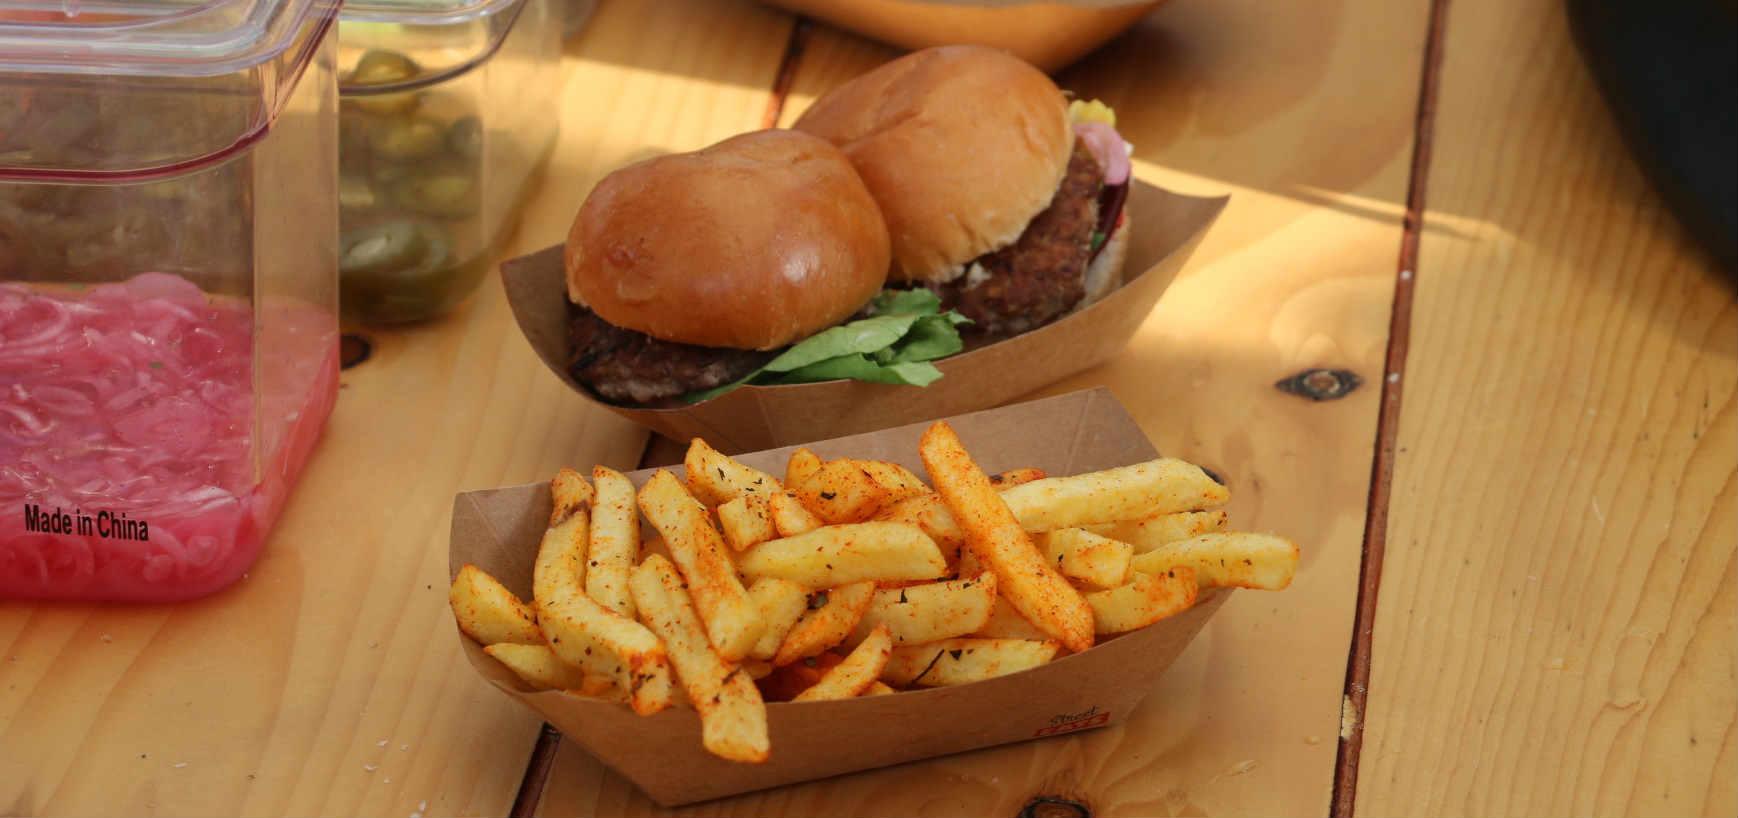 burgers-fries